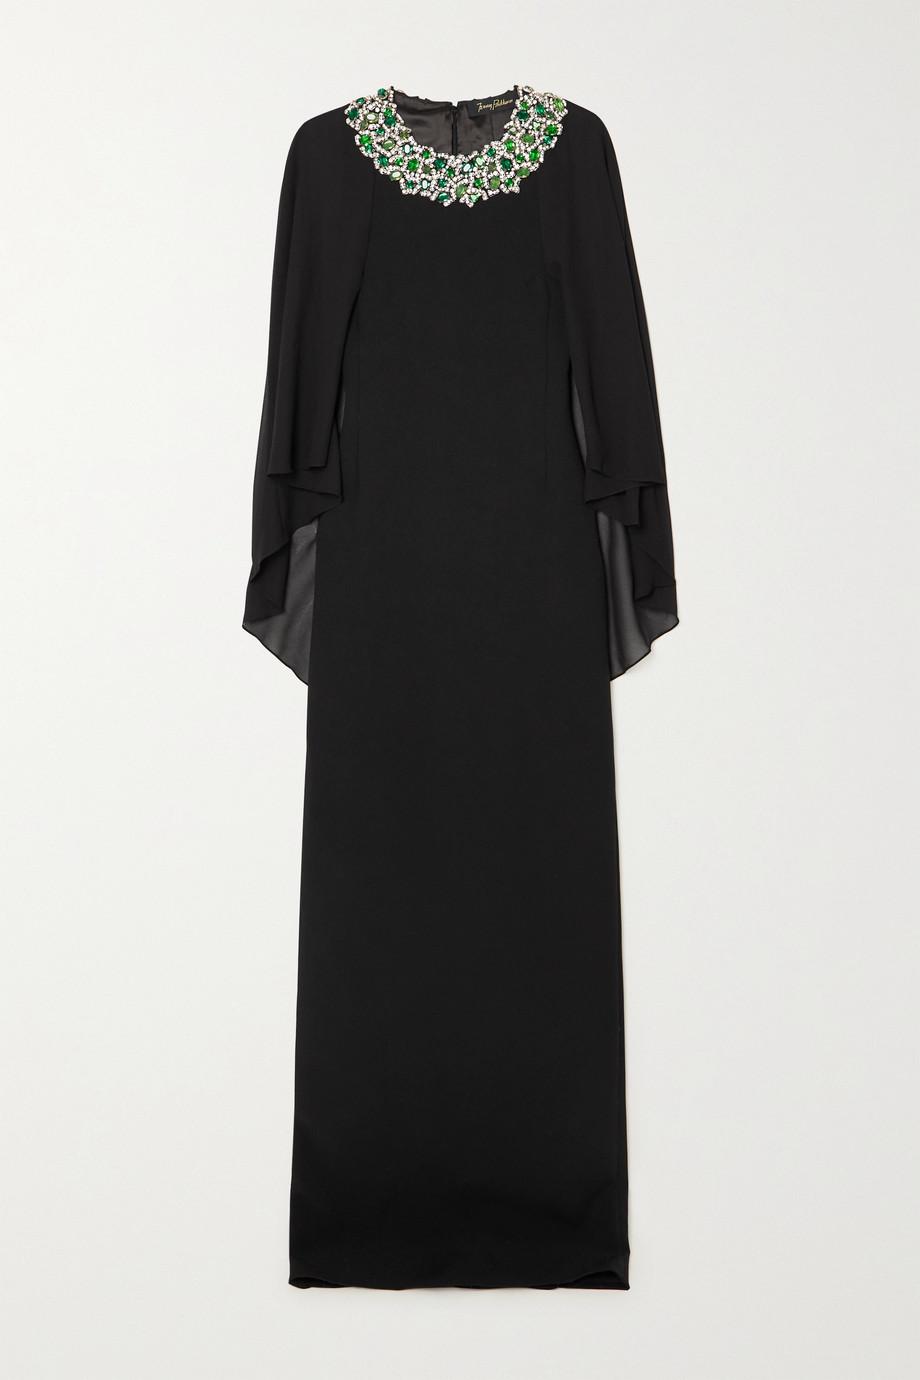 Jenny Packham Audrey embellished crepe and chiffon gown